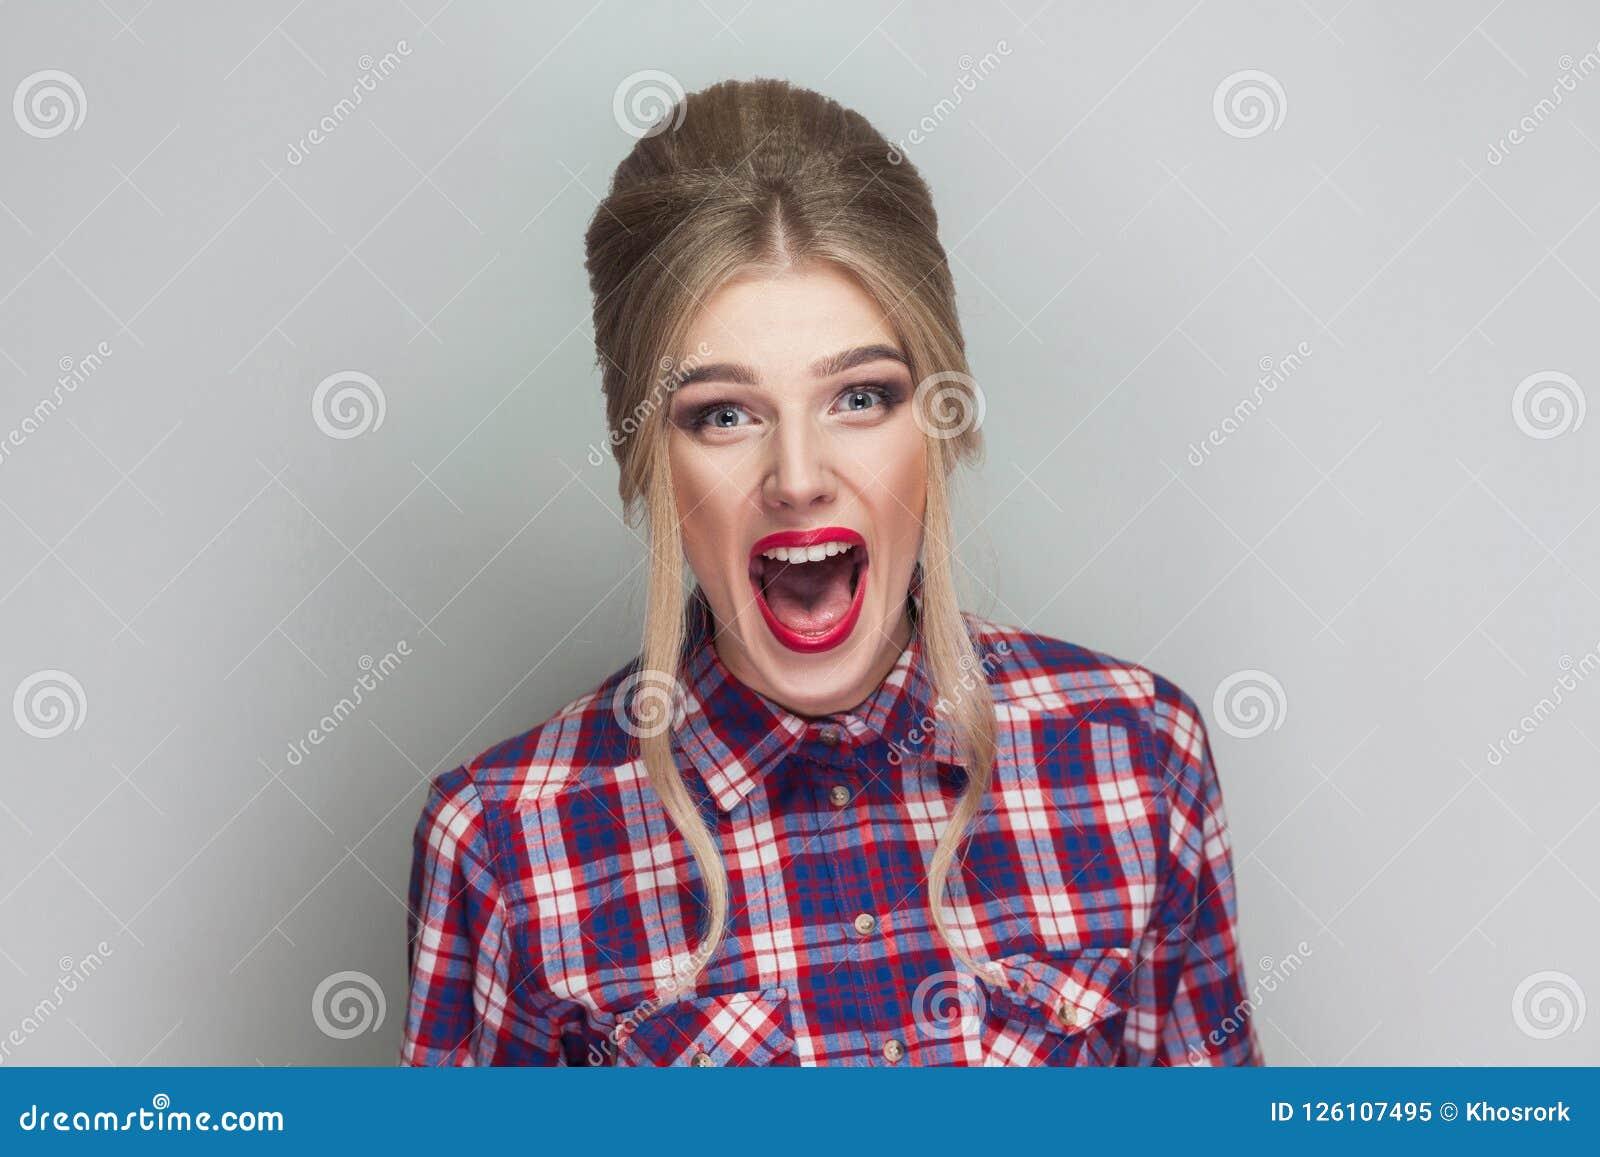 Verbaasd mooi blondemeisje met roze geruit overhemd, collecte